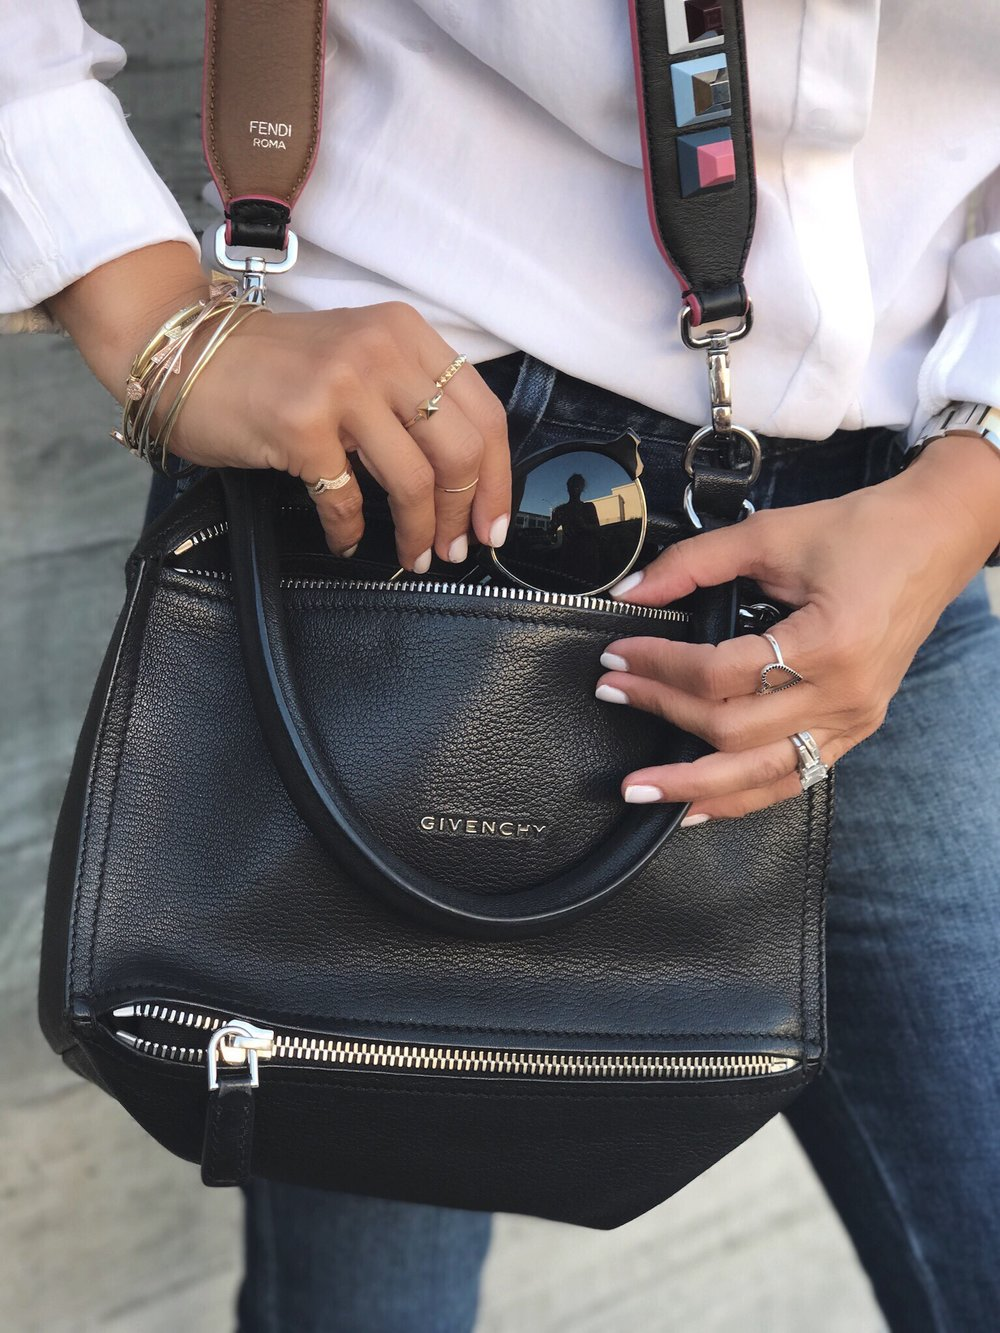 feaf30494e9b6 Fendi Handbag Strap — The Glow Girl by Melissa Meyers